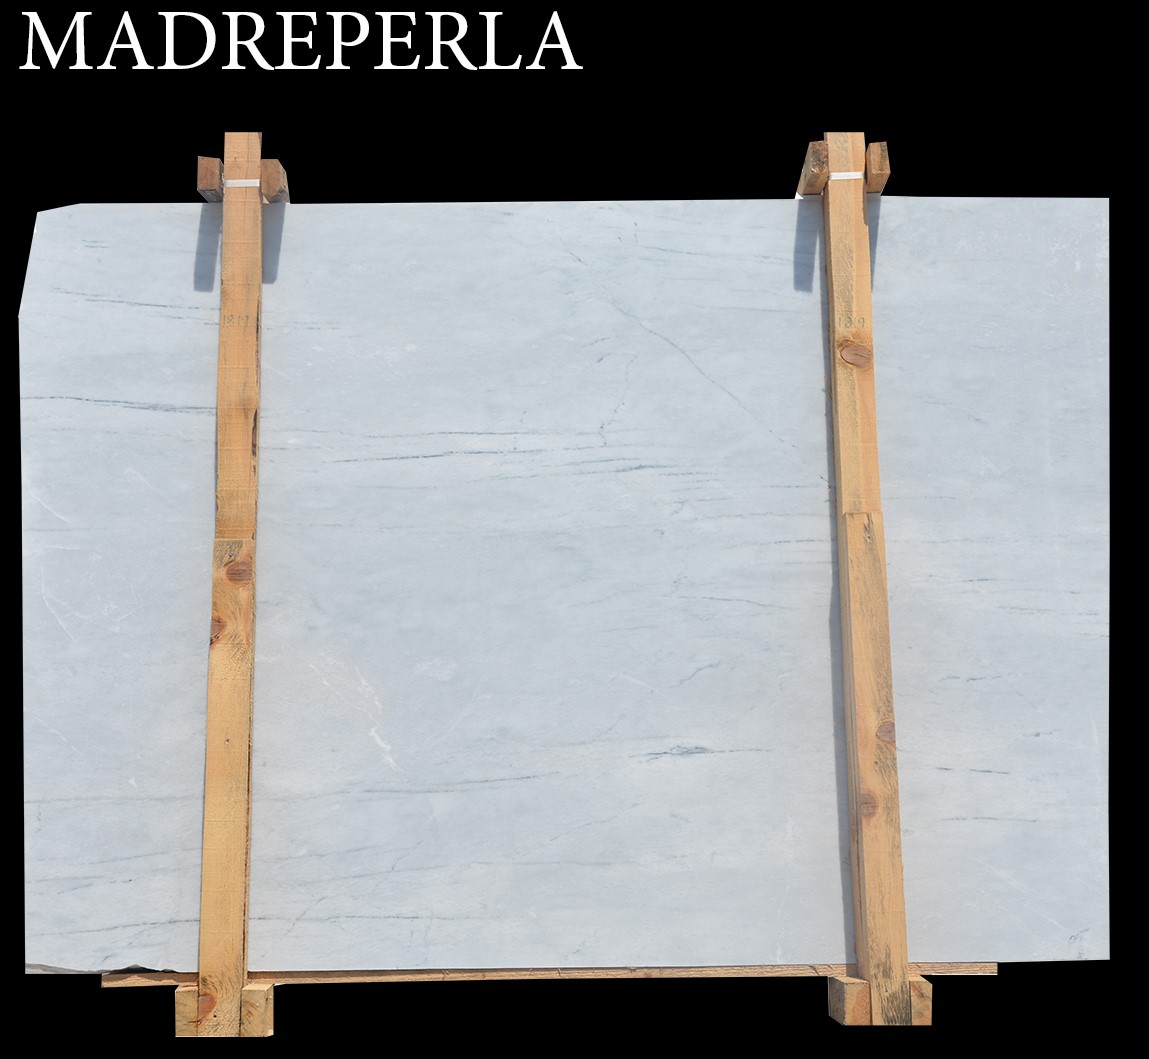 Madreperla Slabs